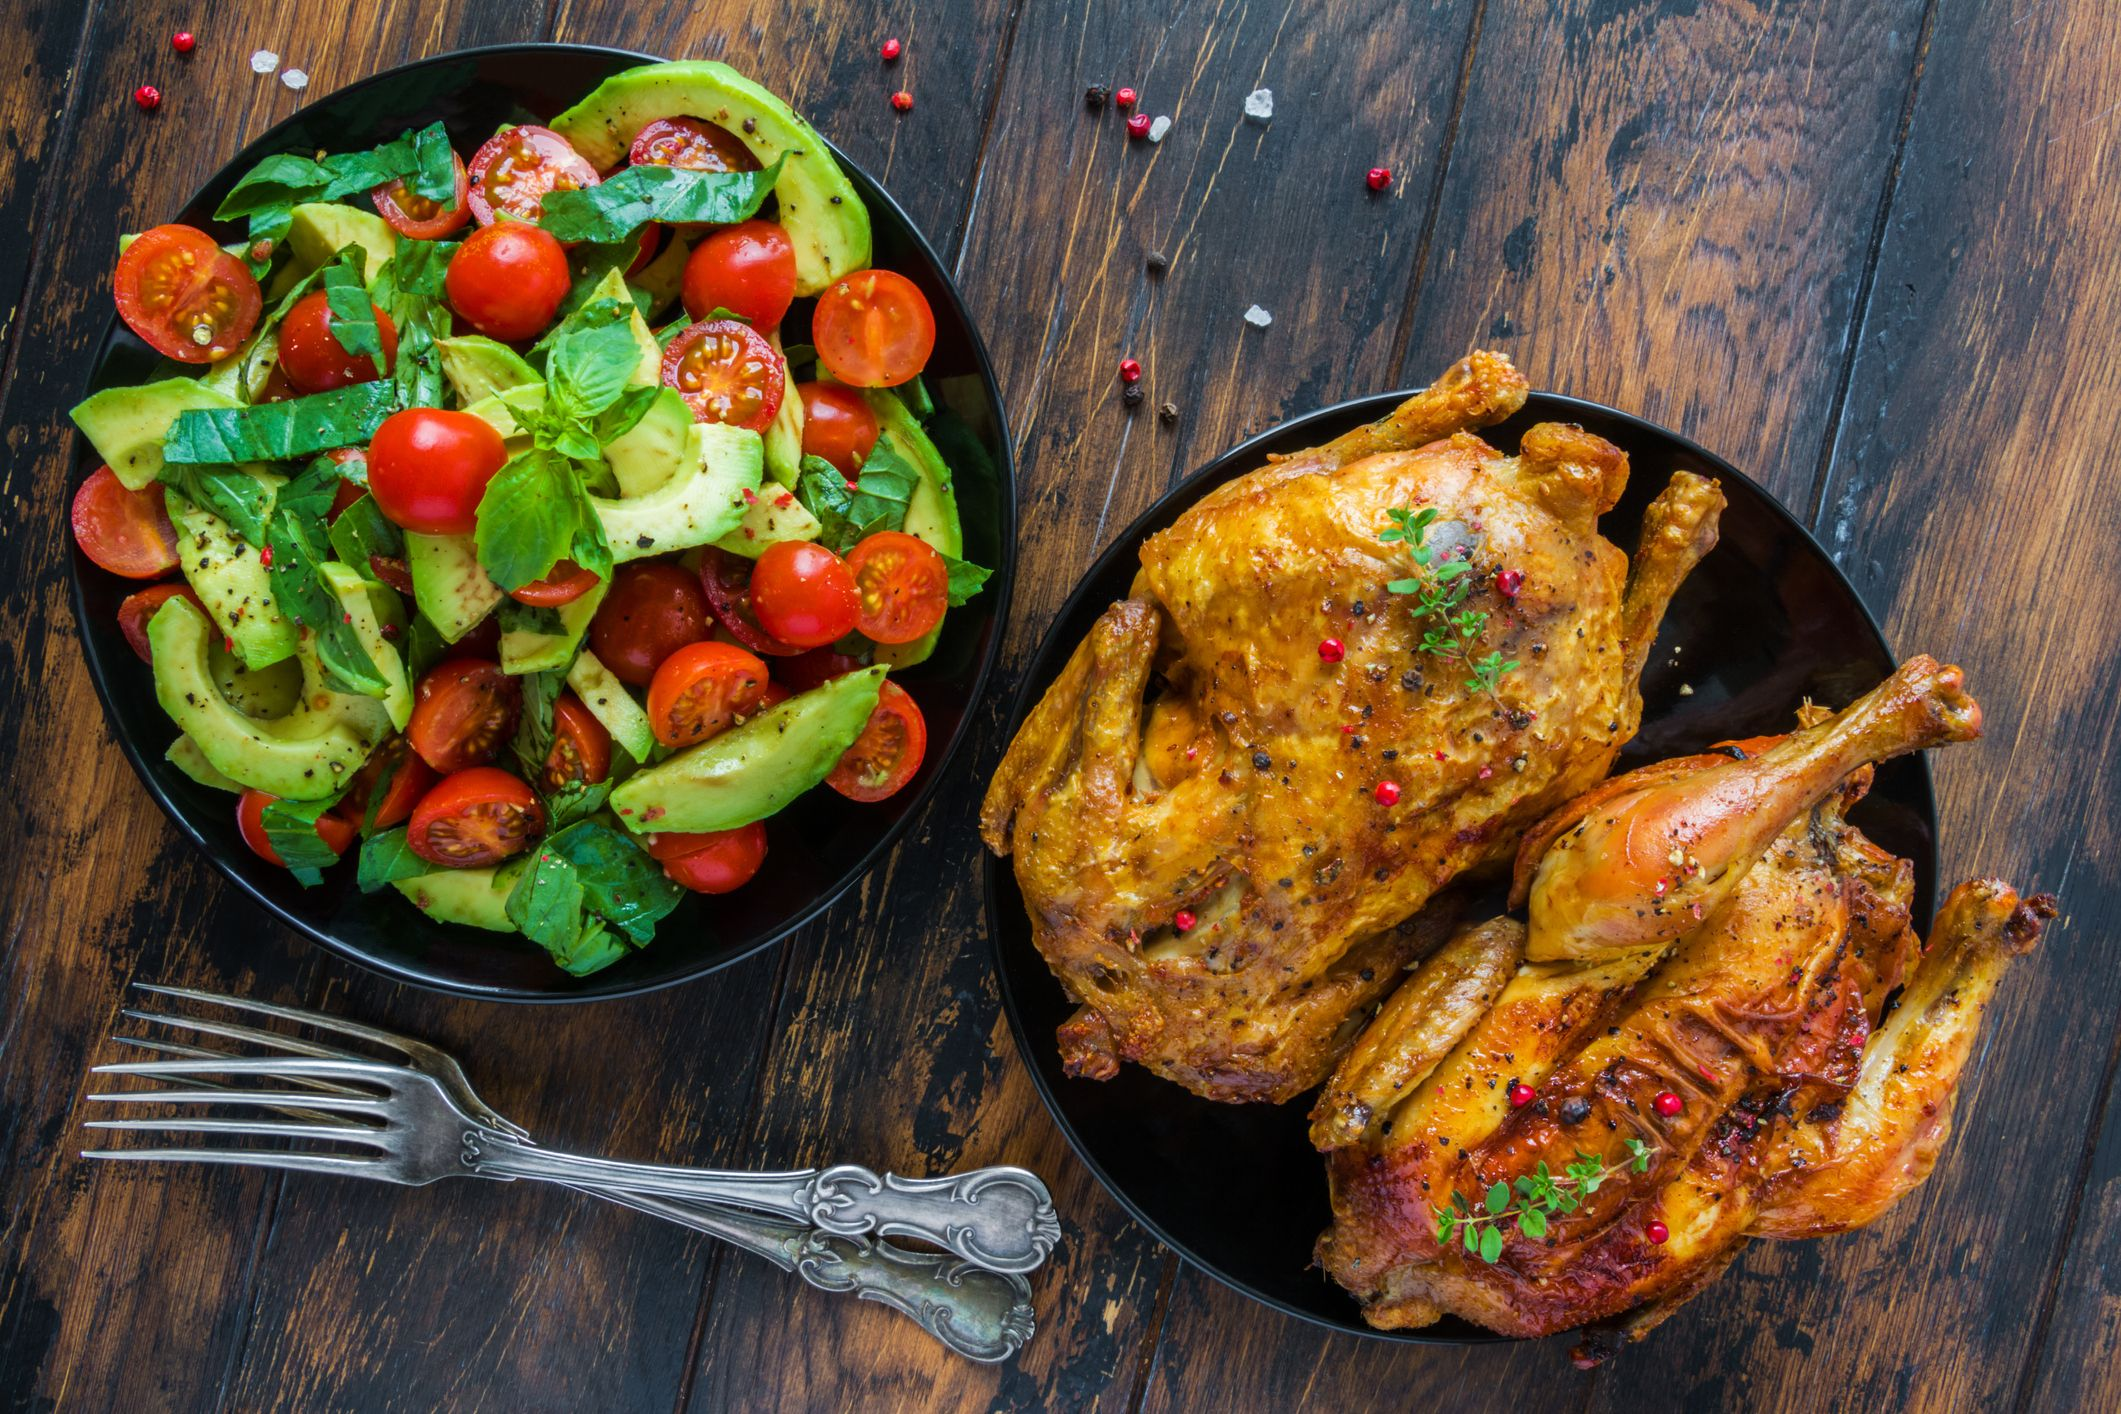 9 Thanksgiving Foods Everyone Secretly Hates